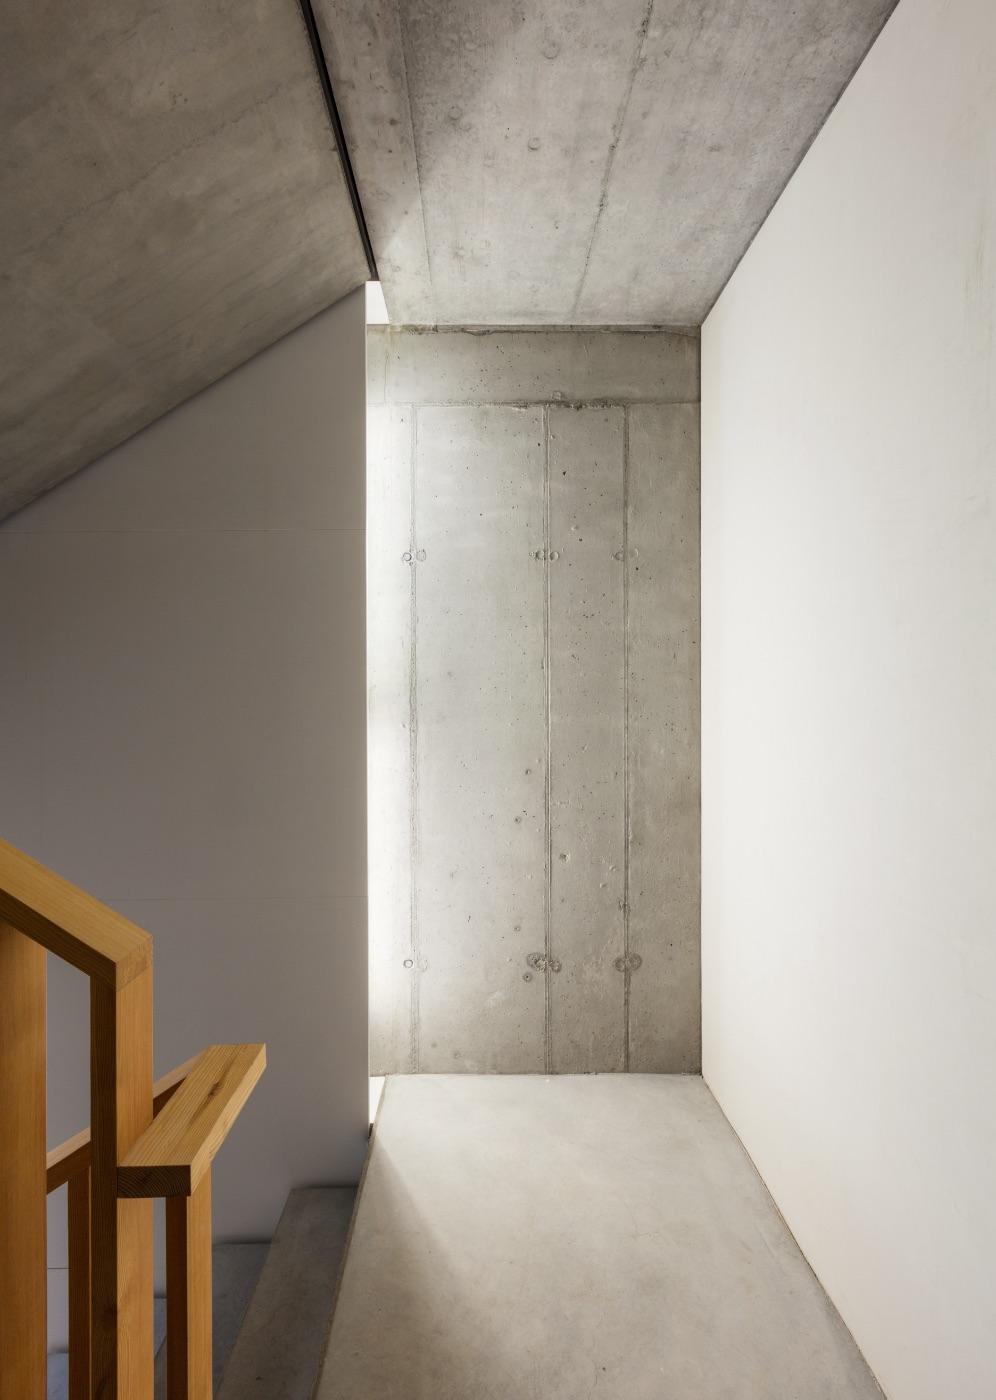 Mid development minimalist concrete wall interior with wooden panels